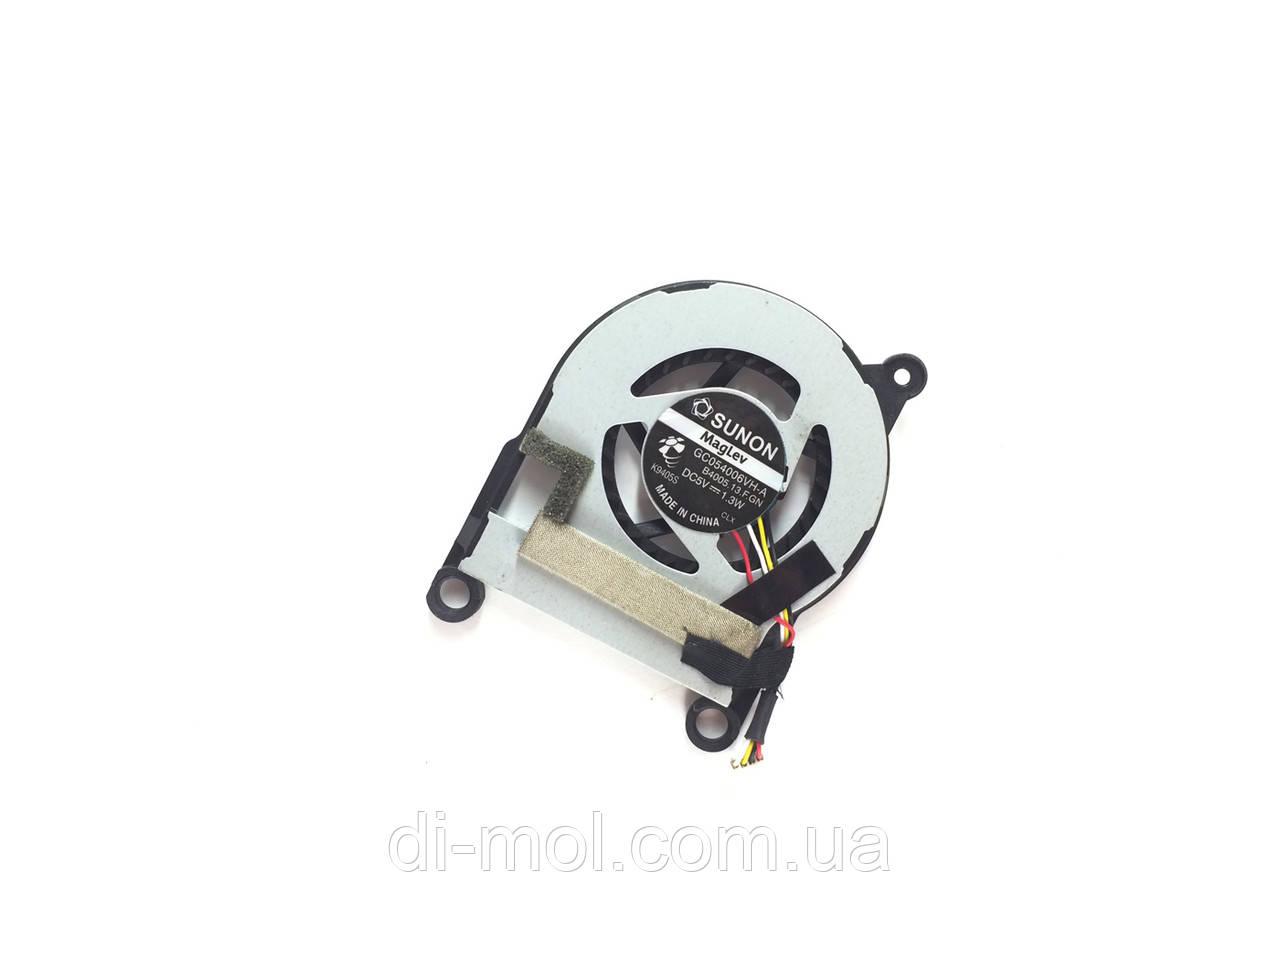 Вентилятор для ноутбука Acer Aspire One 530, 531H, ZG8, G3 series, 4-pin